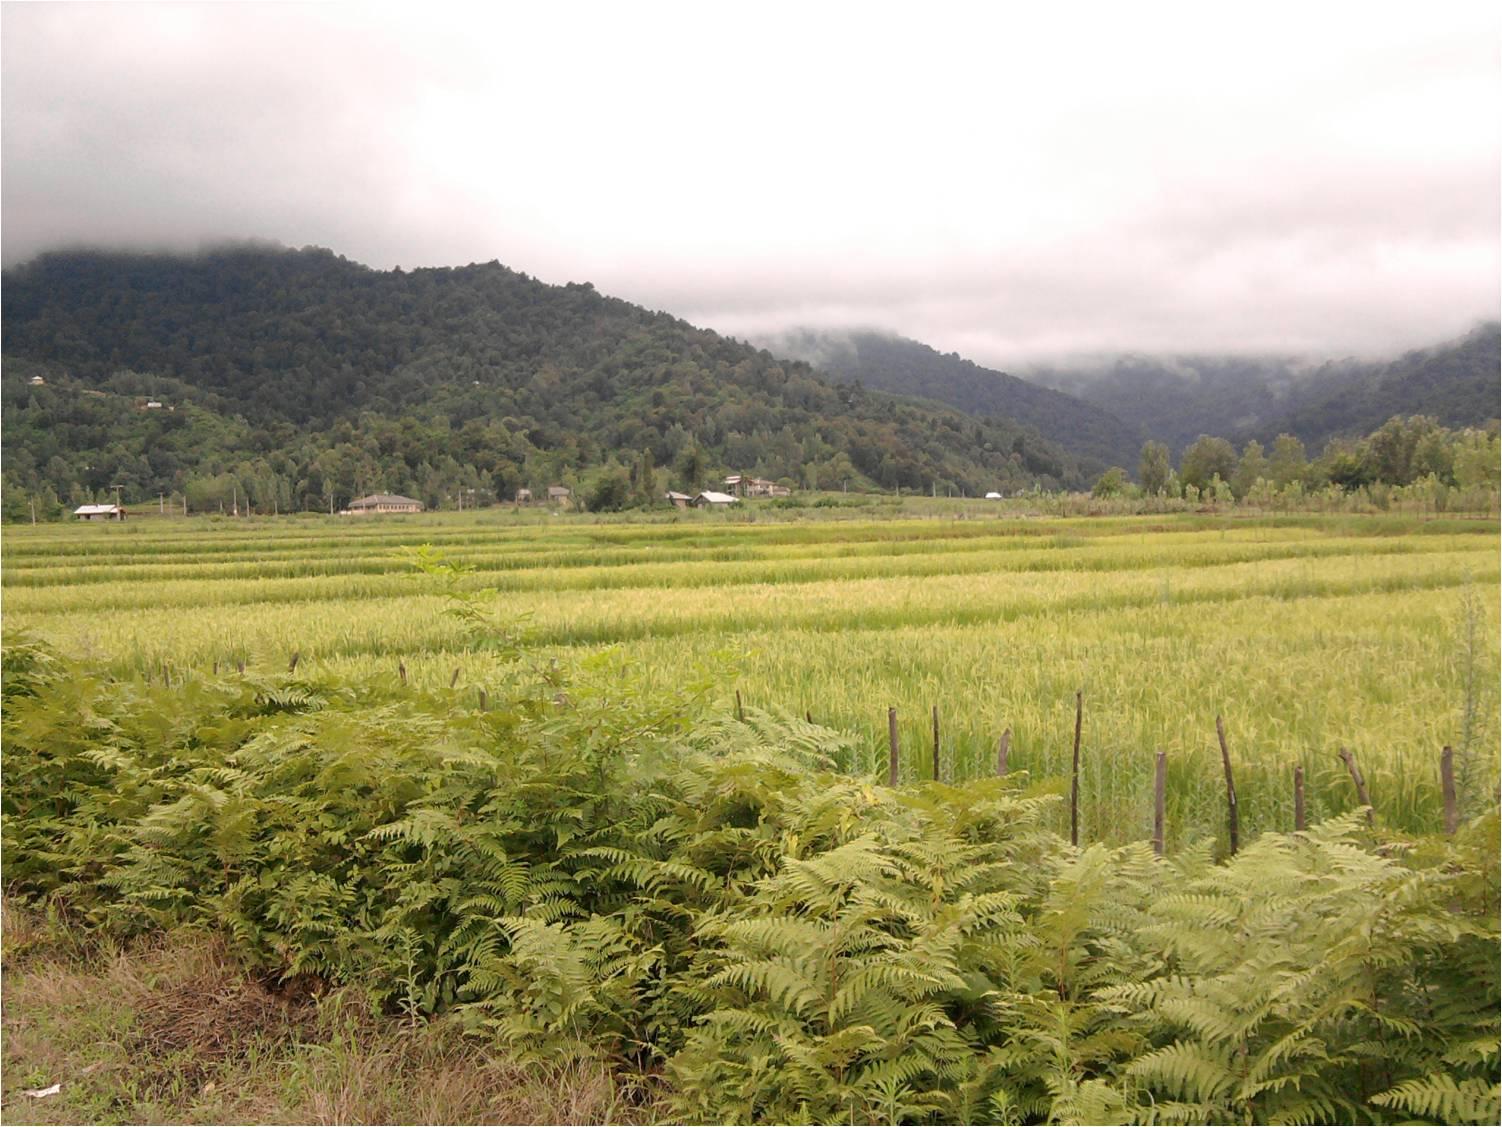 مزارع شالیزار (برنج) روستای شولم تابستان 1392